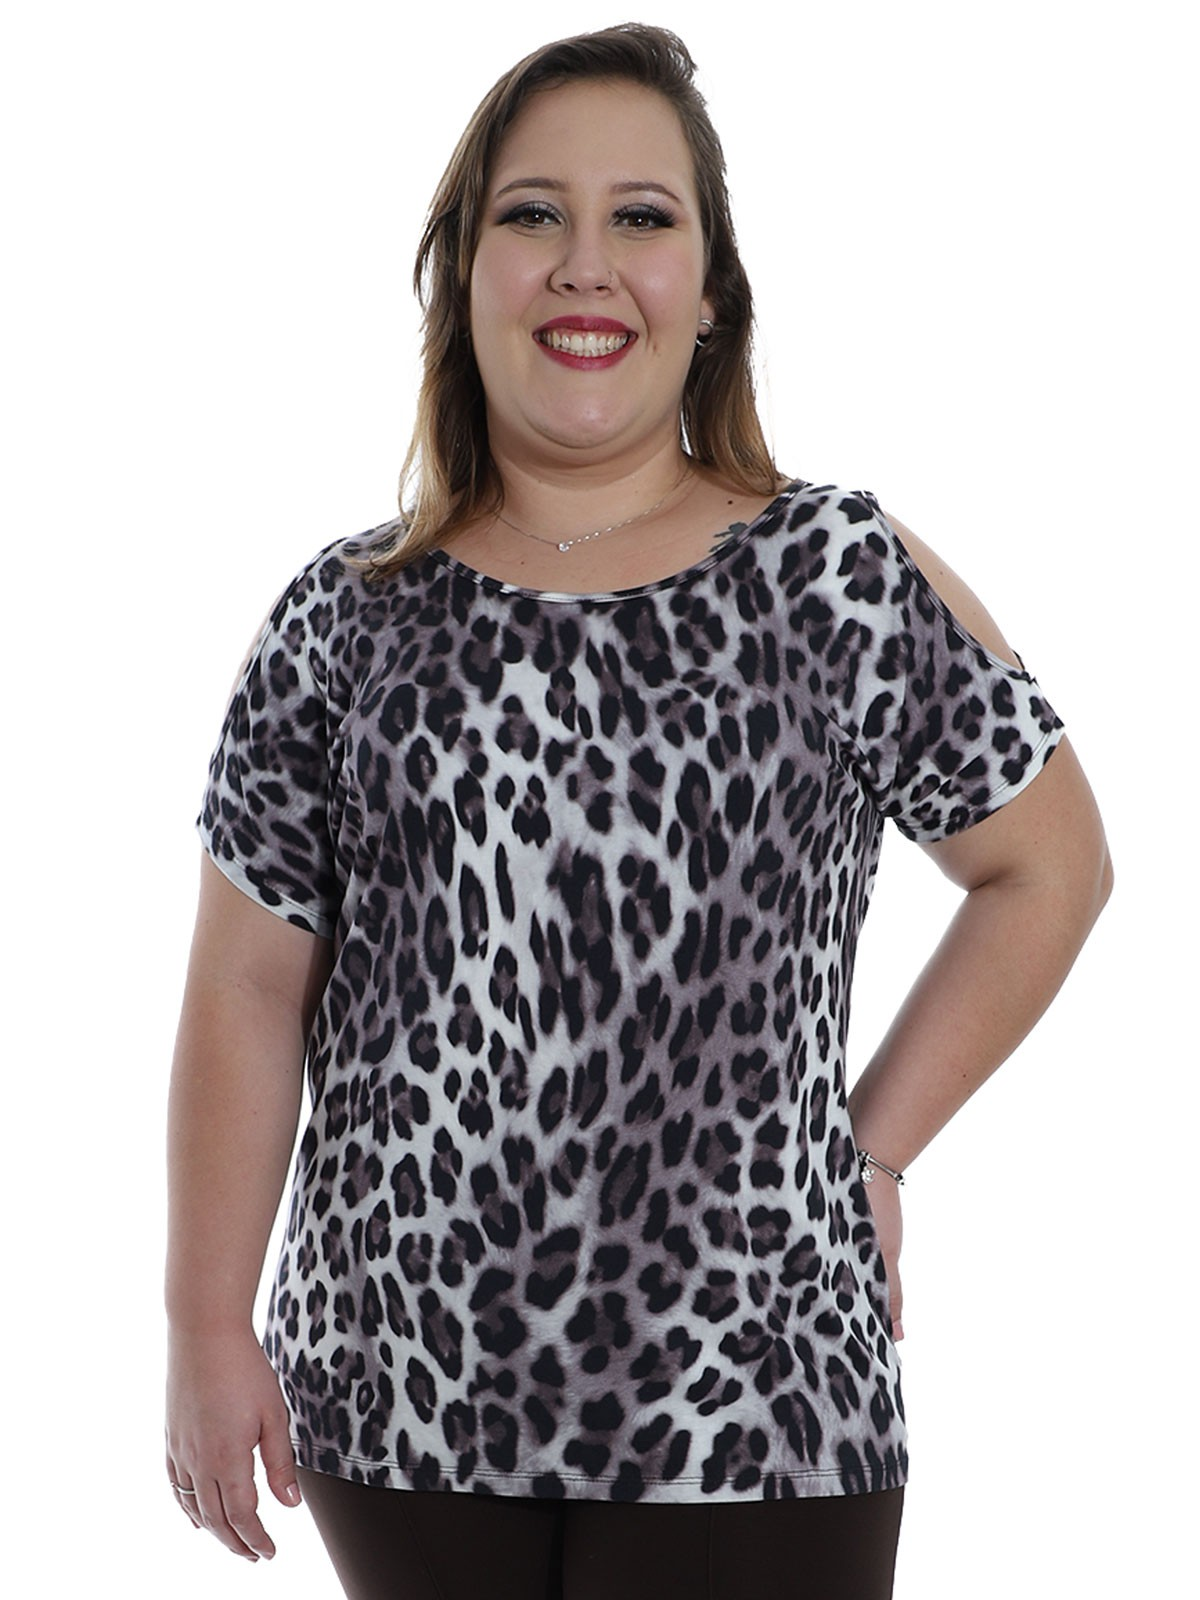 Blusa Plus Size KTS Ombro Diferenciado Preto